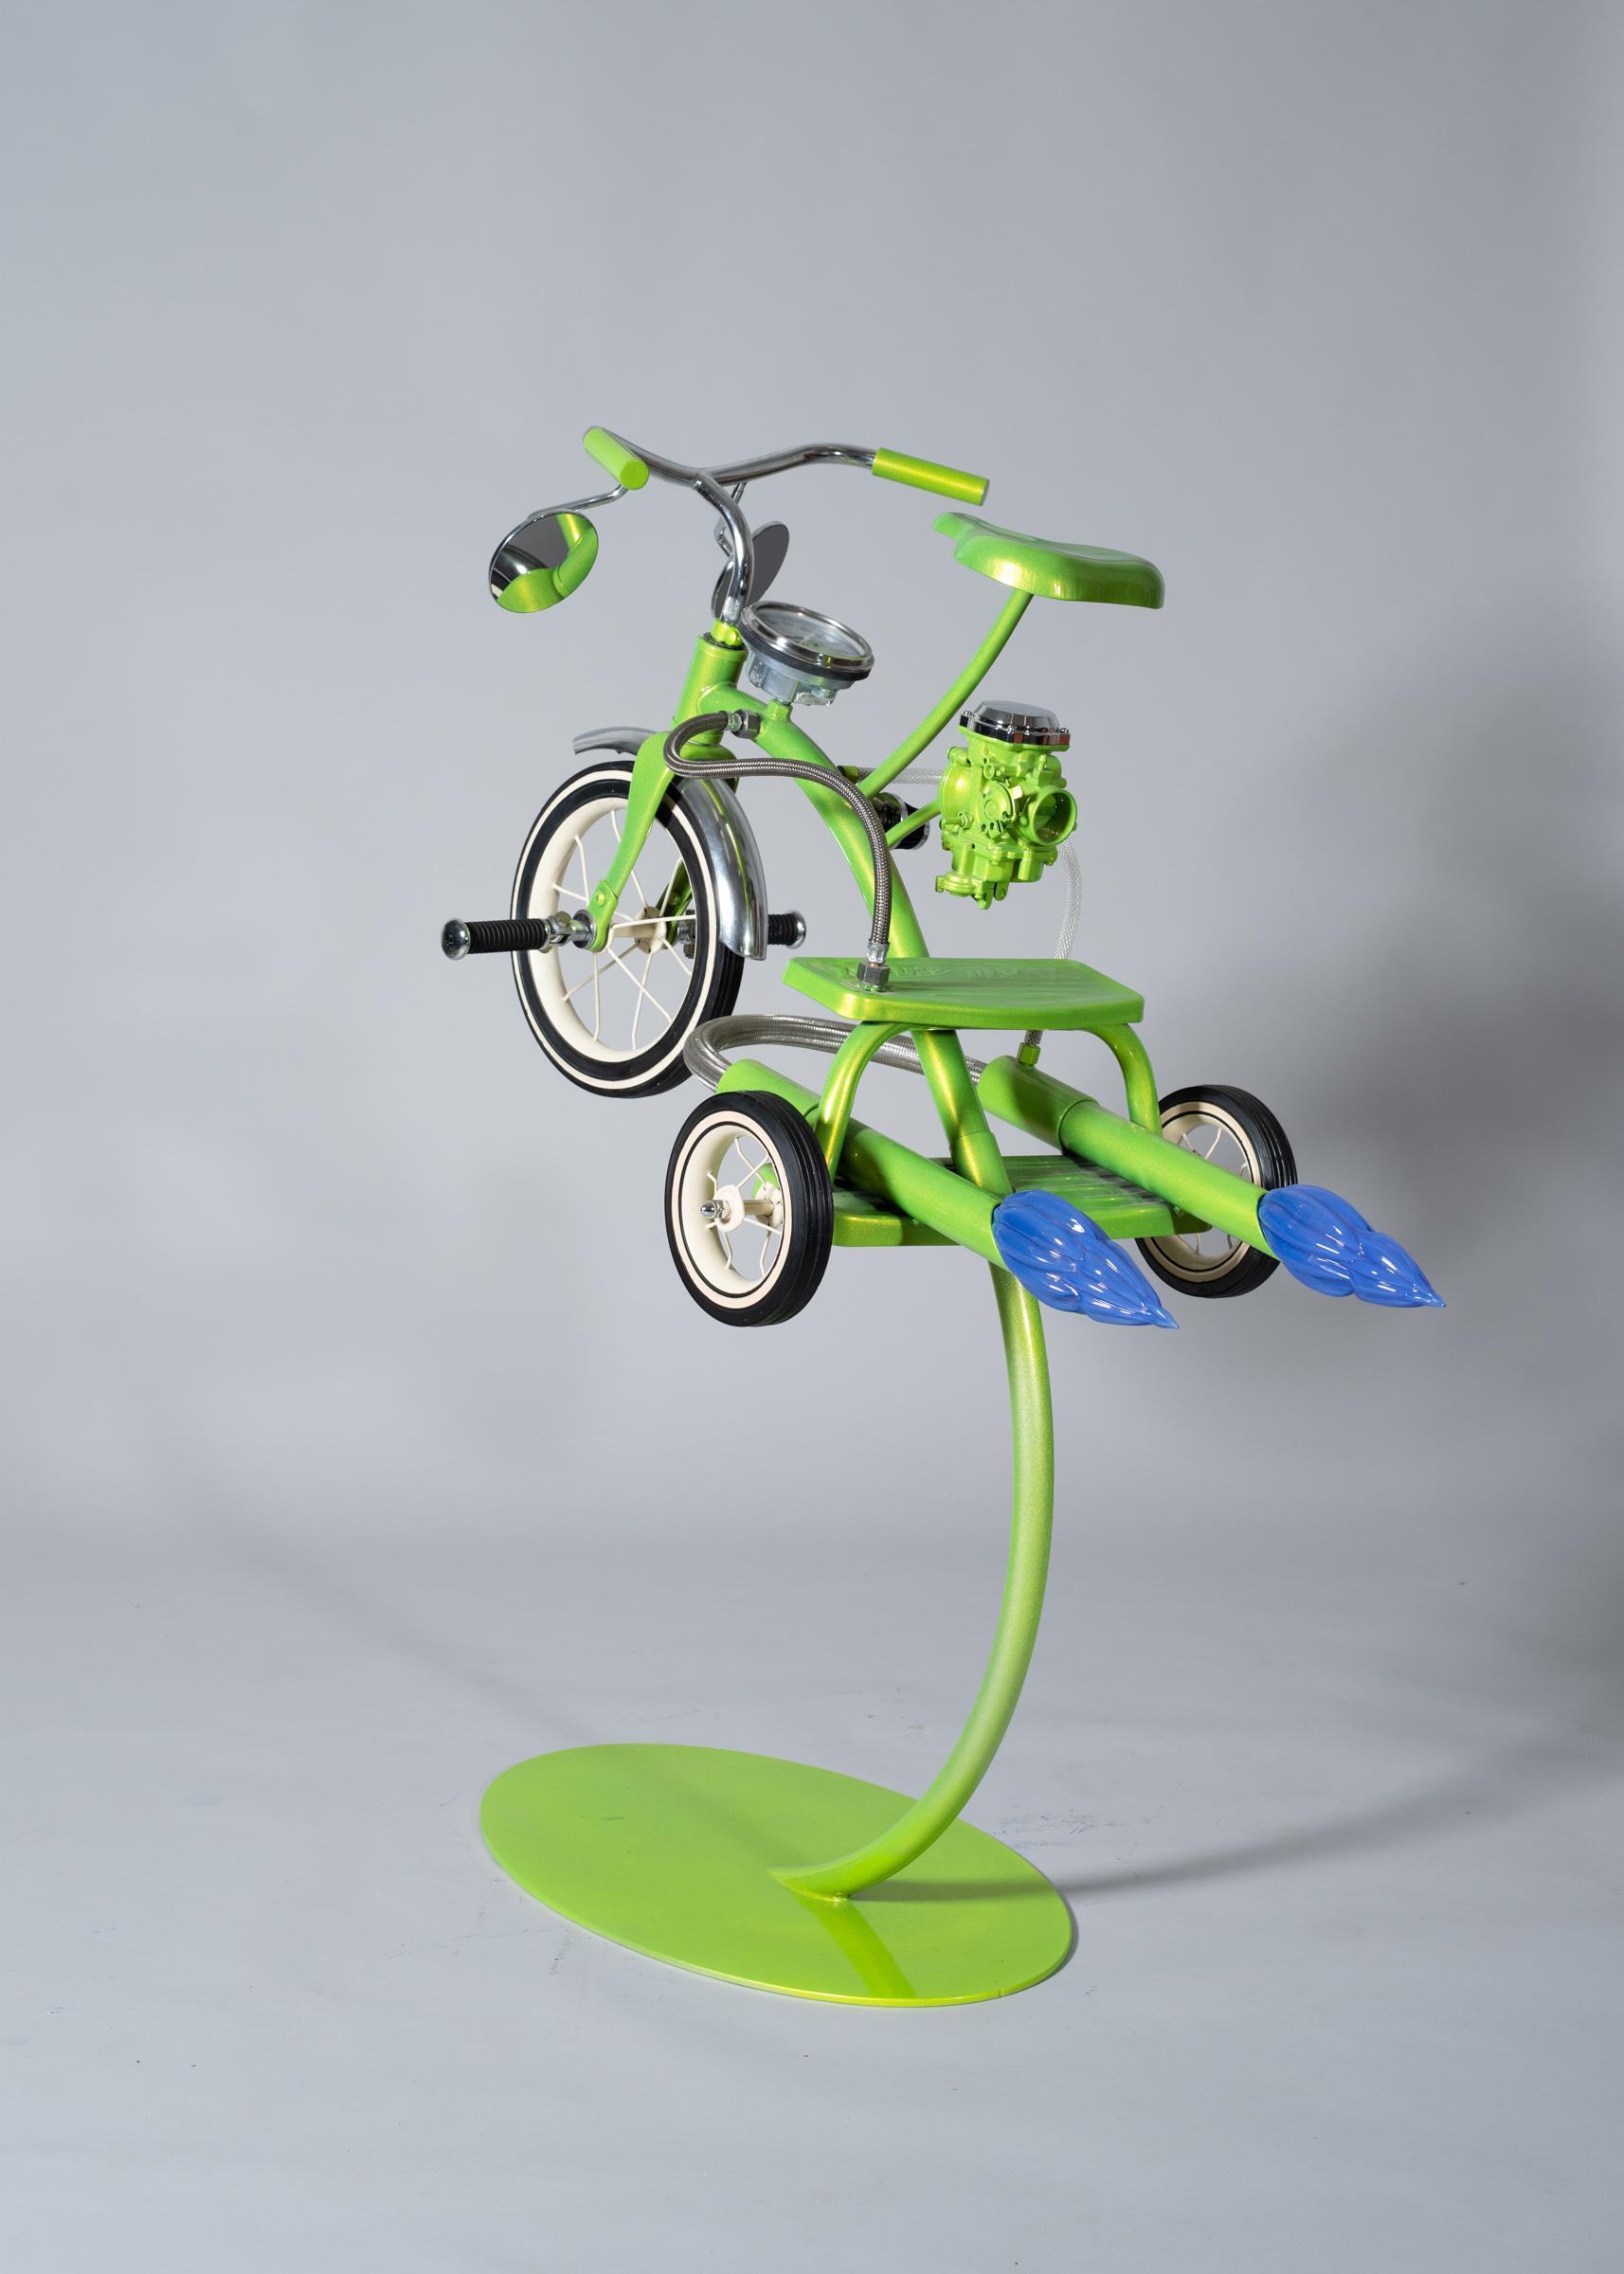 Joker Electric Green Stand